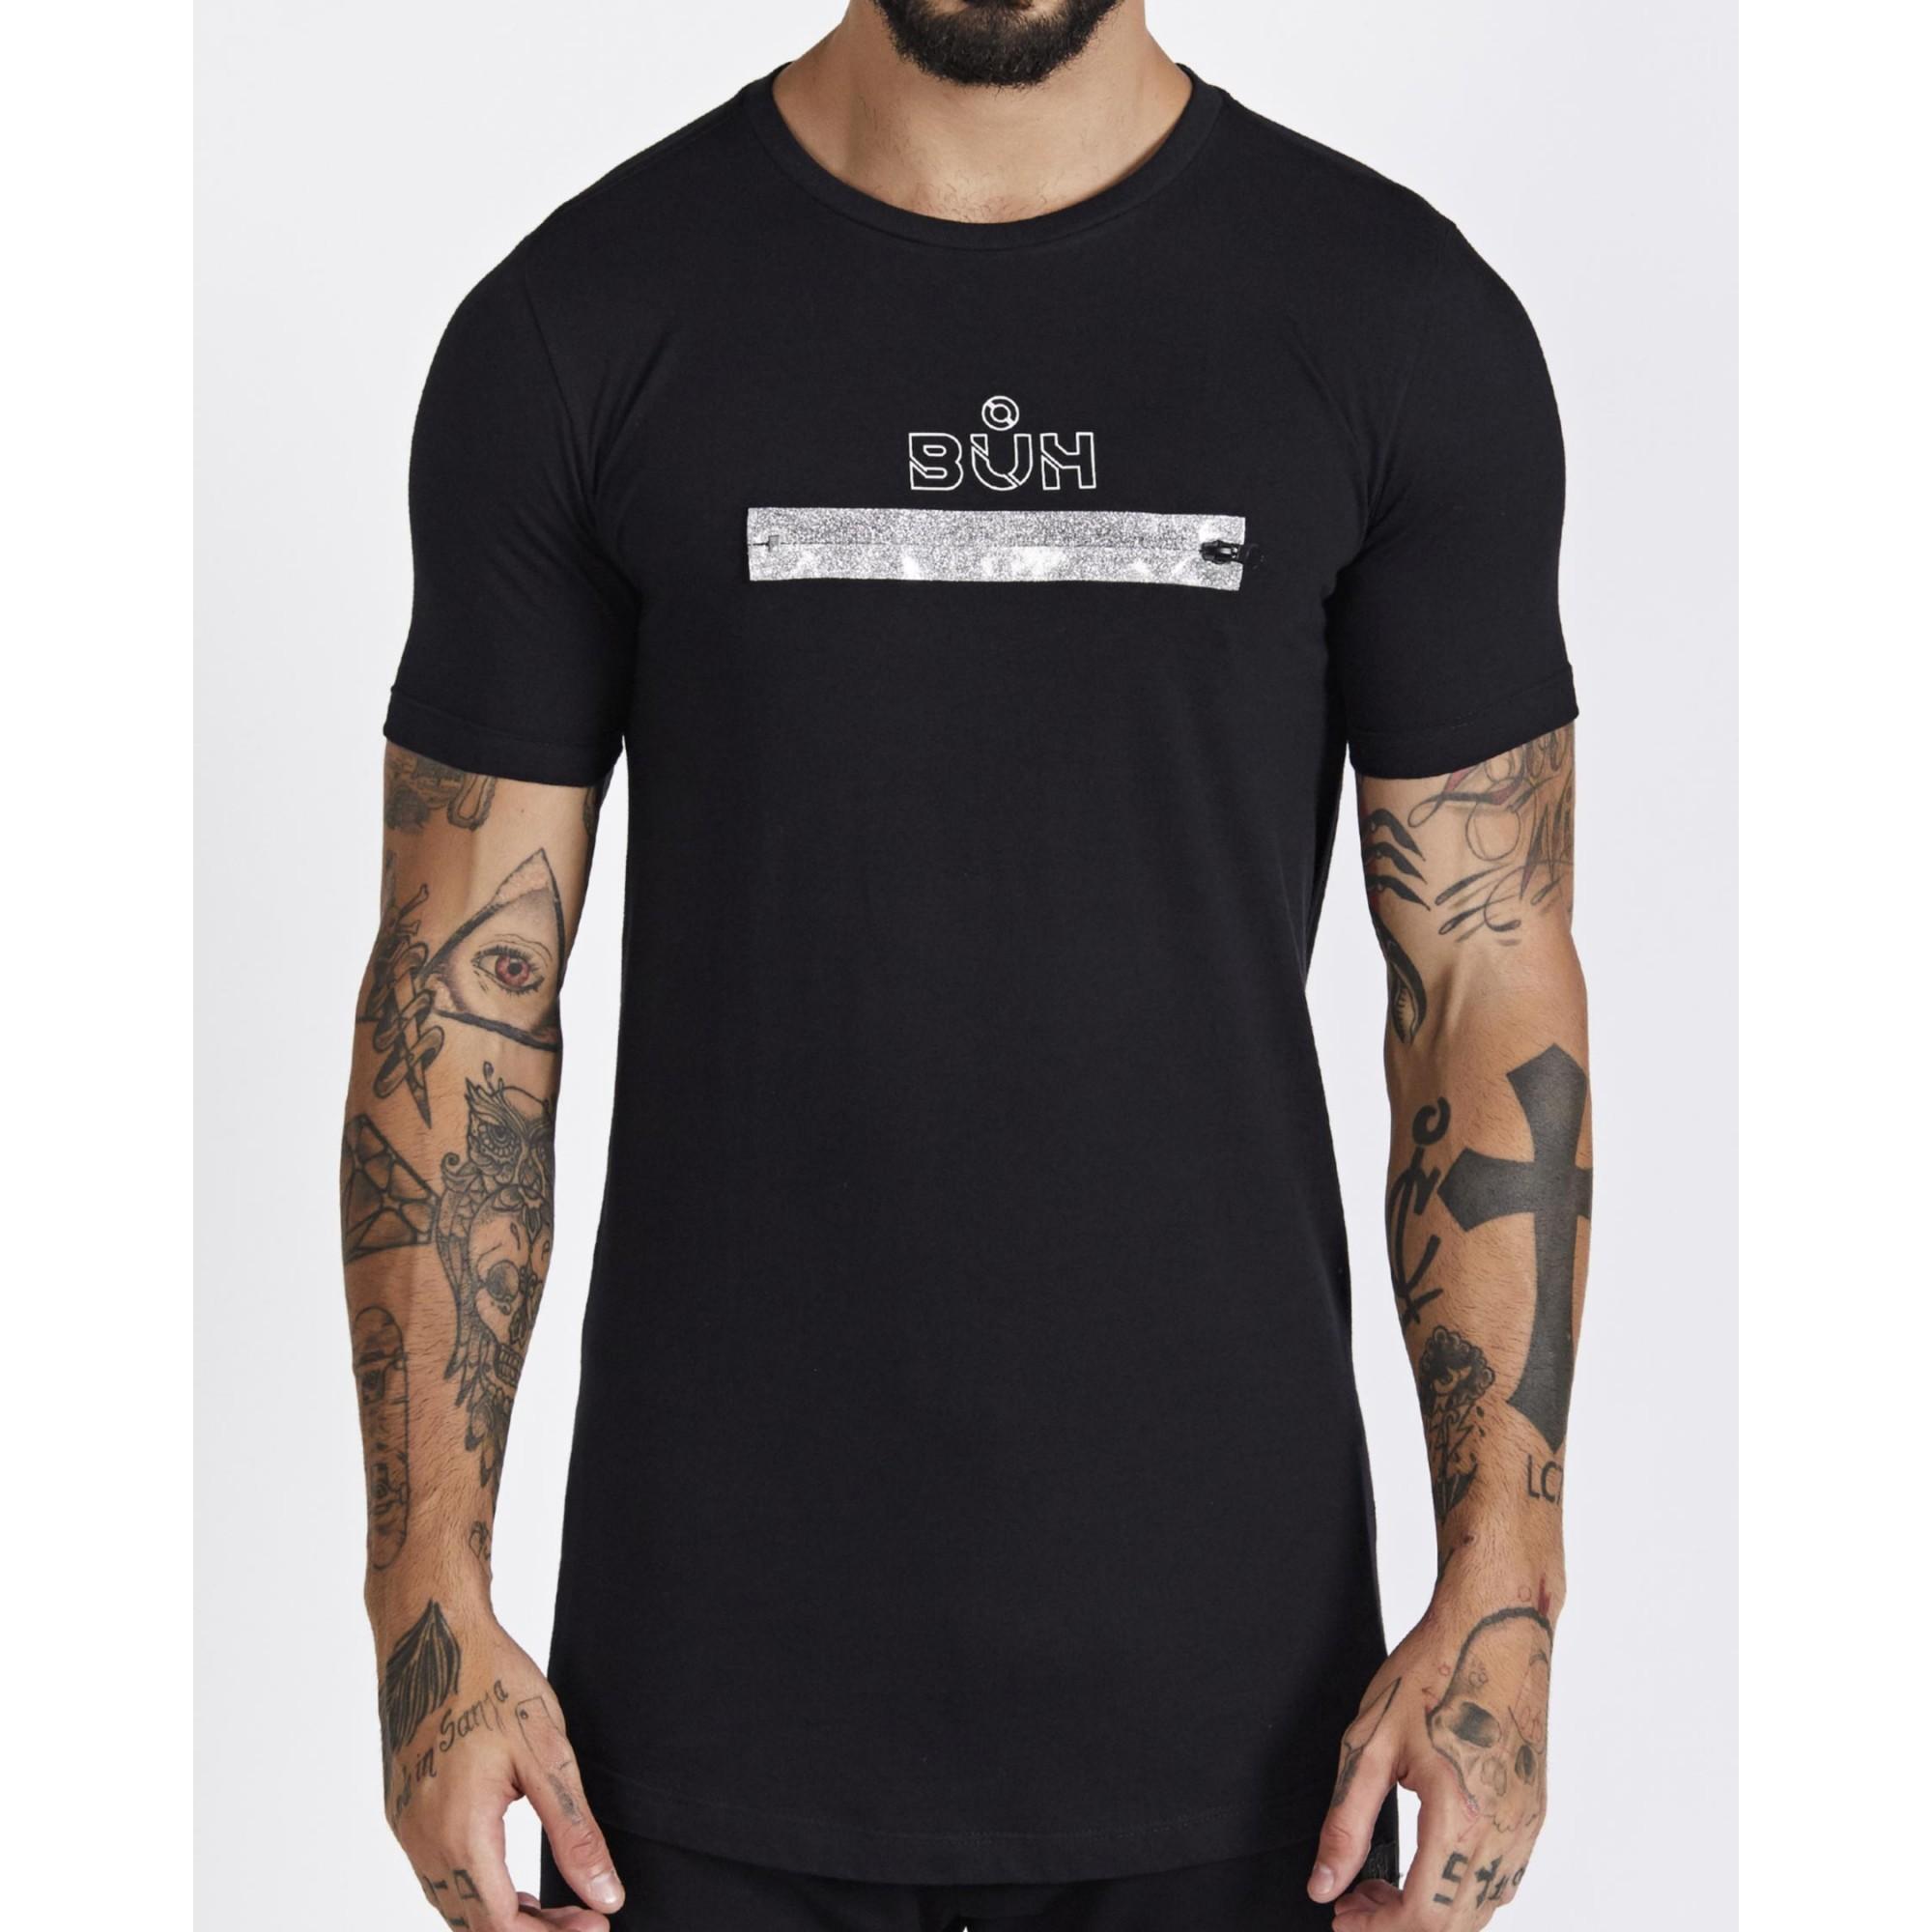 Camiseta Buh Zíper Glitter Black